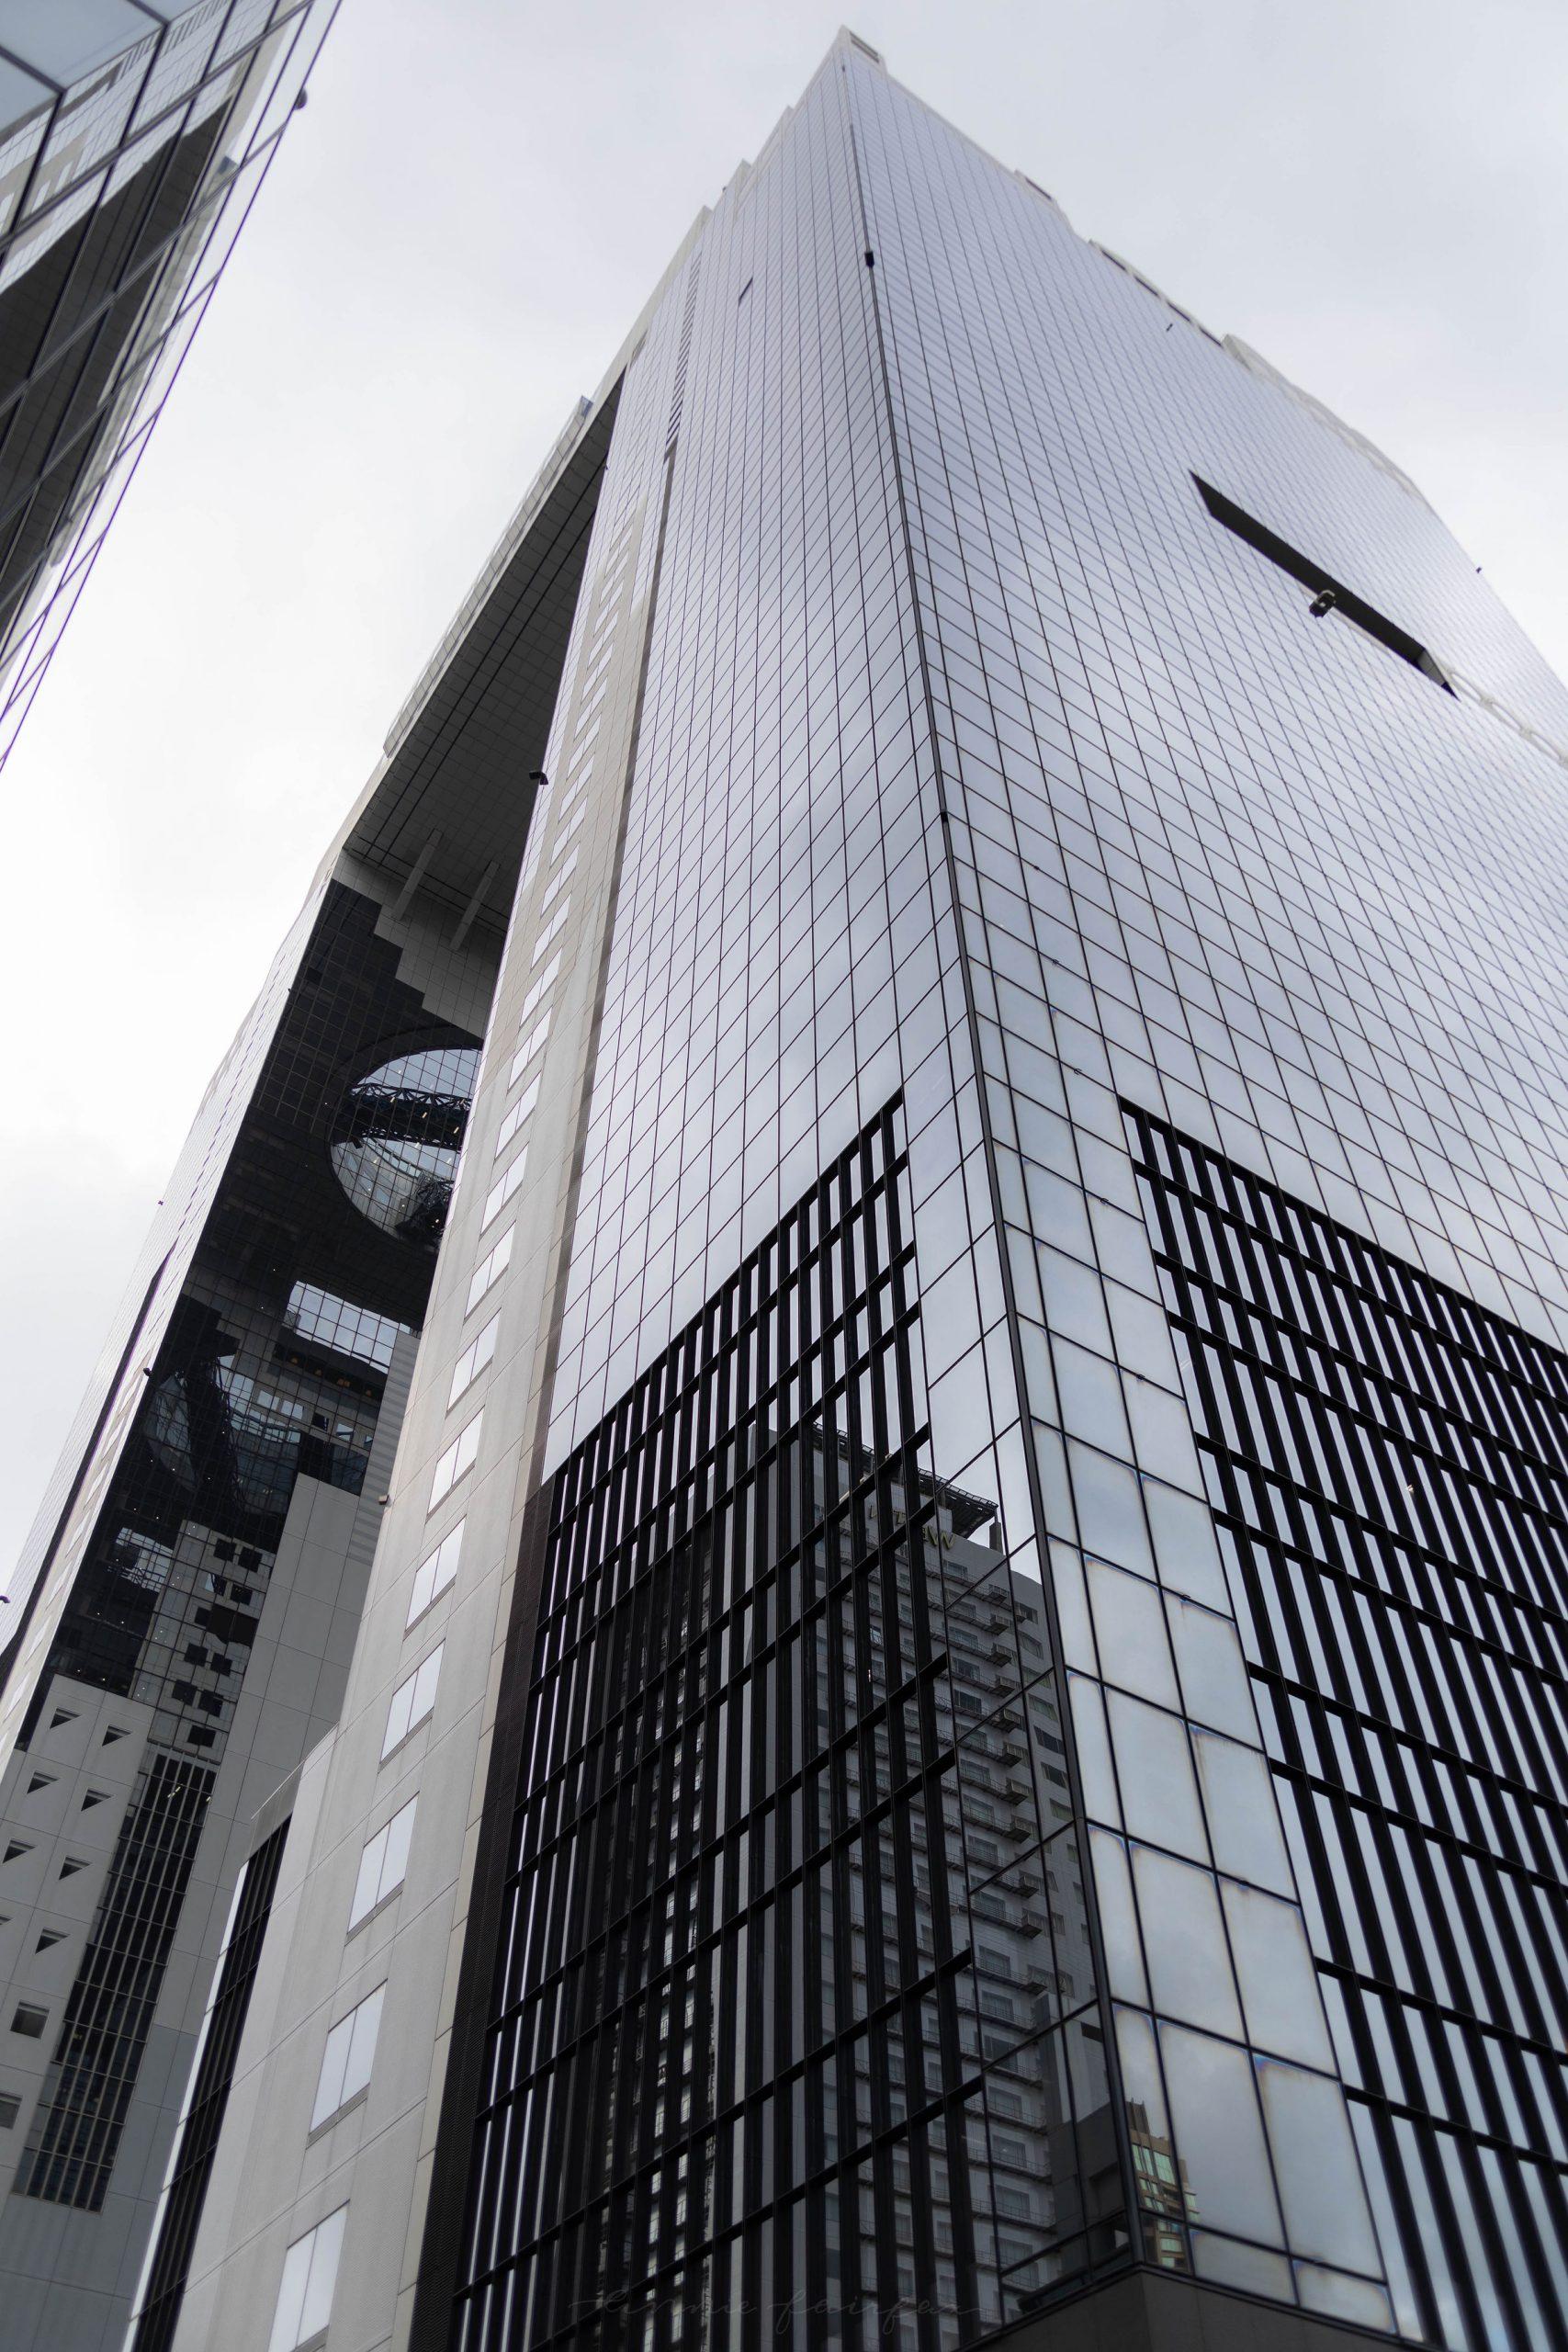 Osaka Umeda Sky Building Osaka Japan Travel Guide